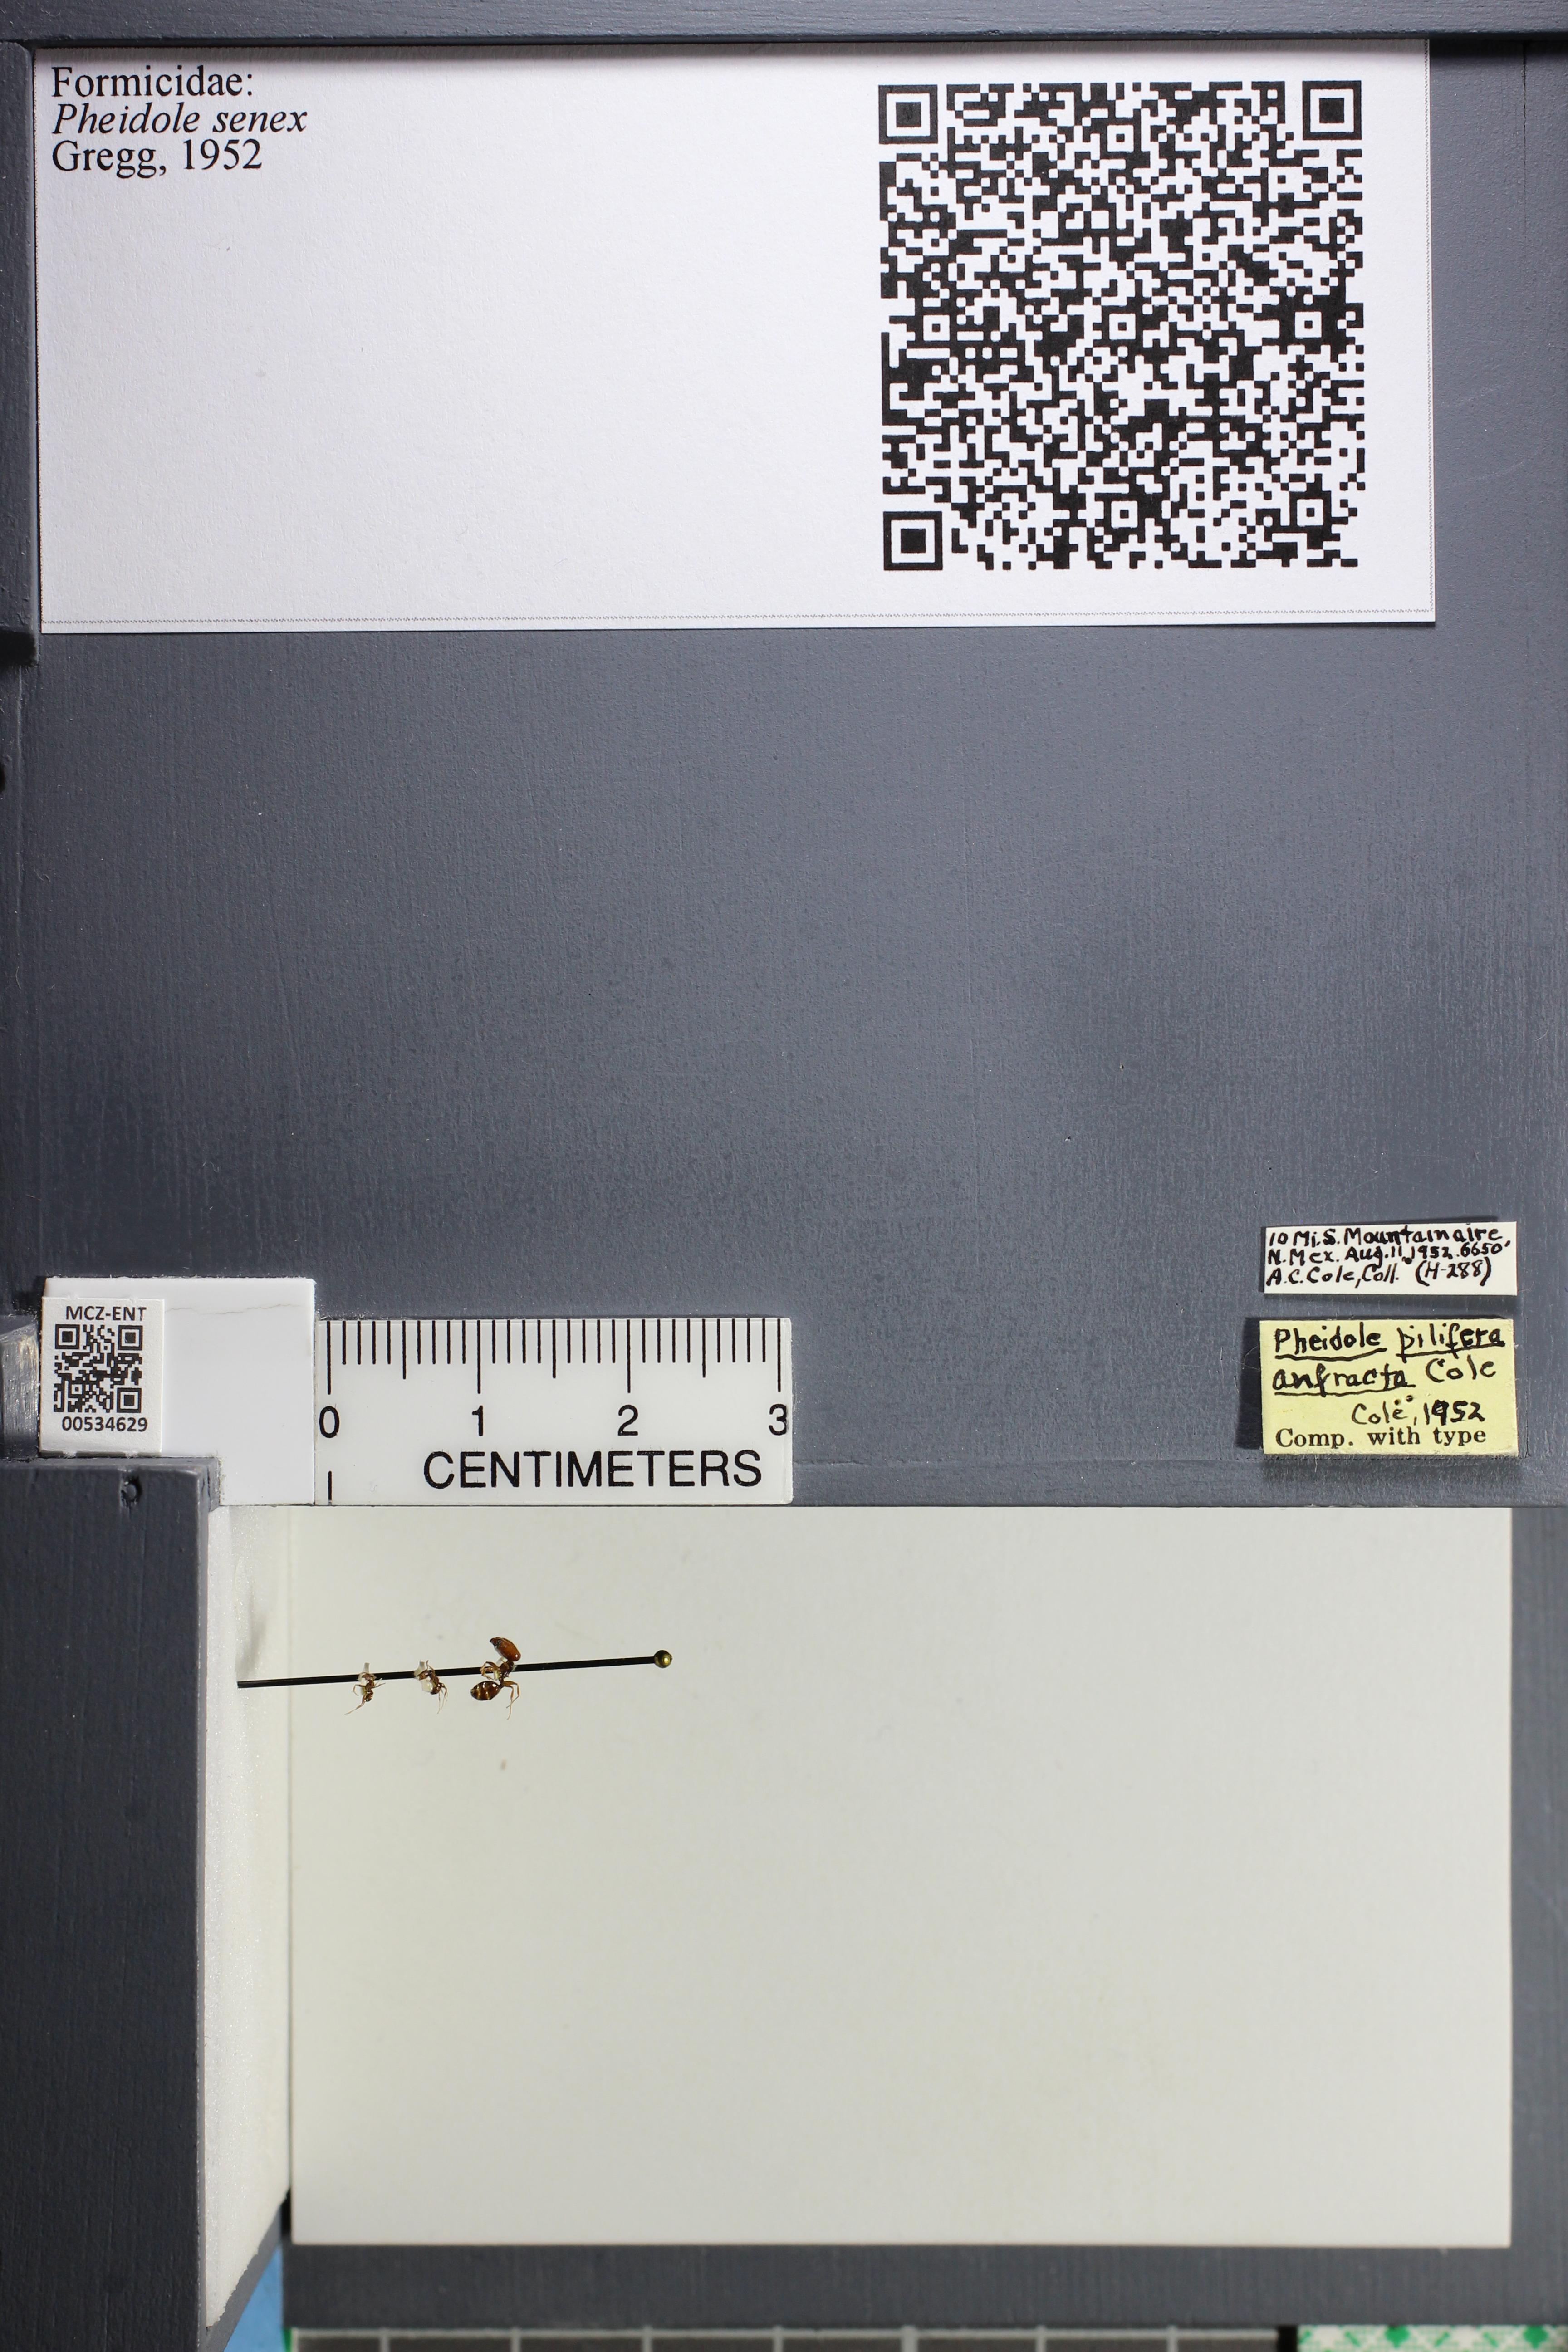 Media of type image, MCZ:Ent:534629 Identified as Pheidole senex.